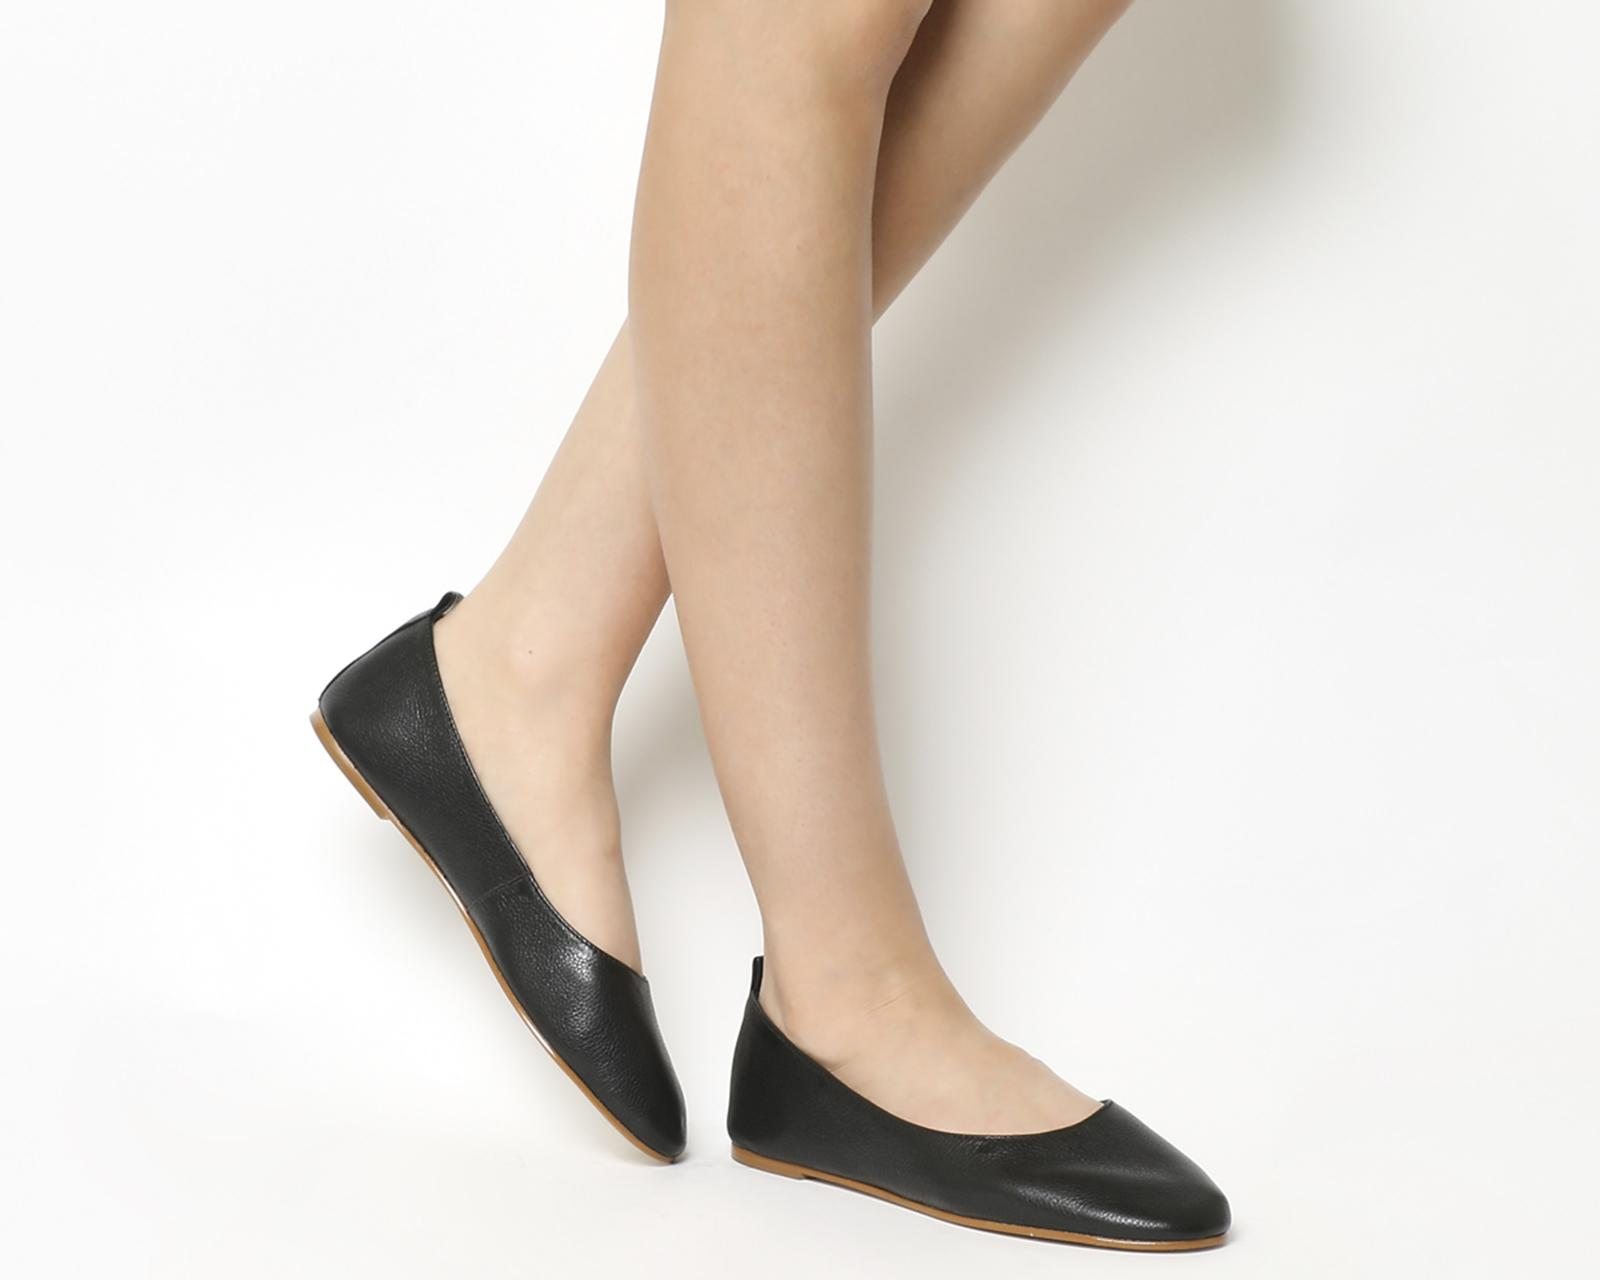 882af5e220eb Lyst - Office Primrose Ballerina Flats in Black